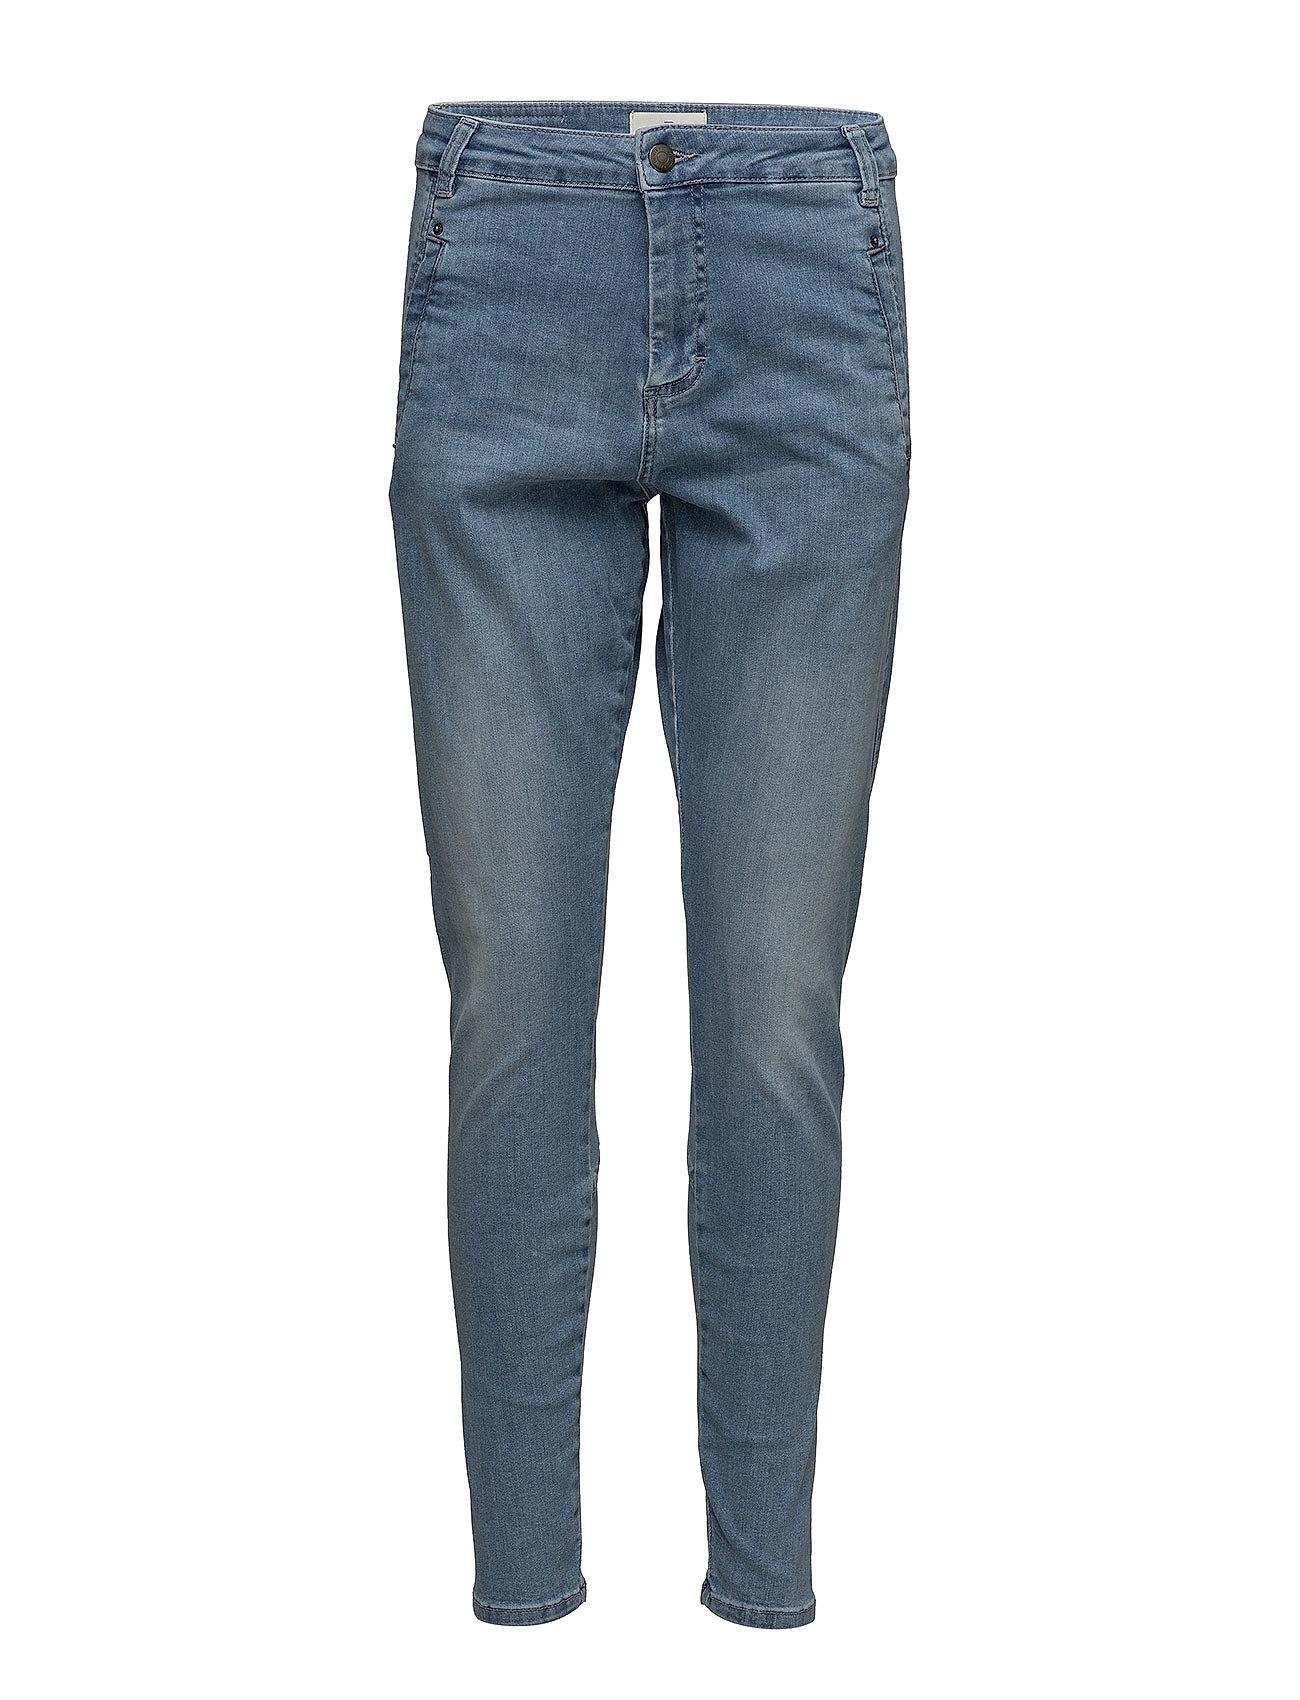 Jolie 680 Kansas Light Blue, Jeans - KANSAS LIGHT BLUE